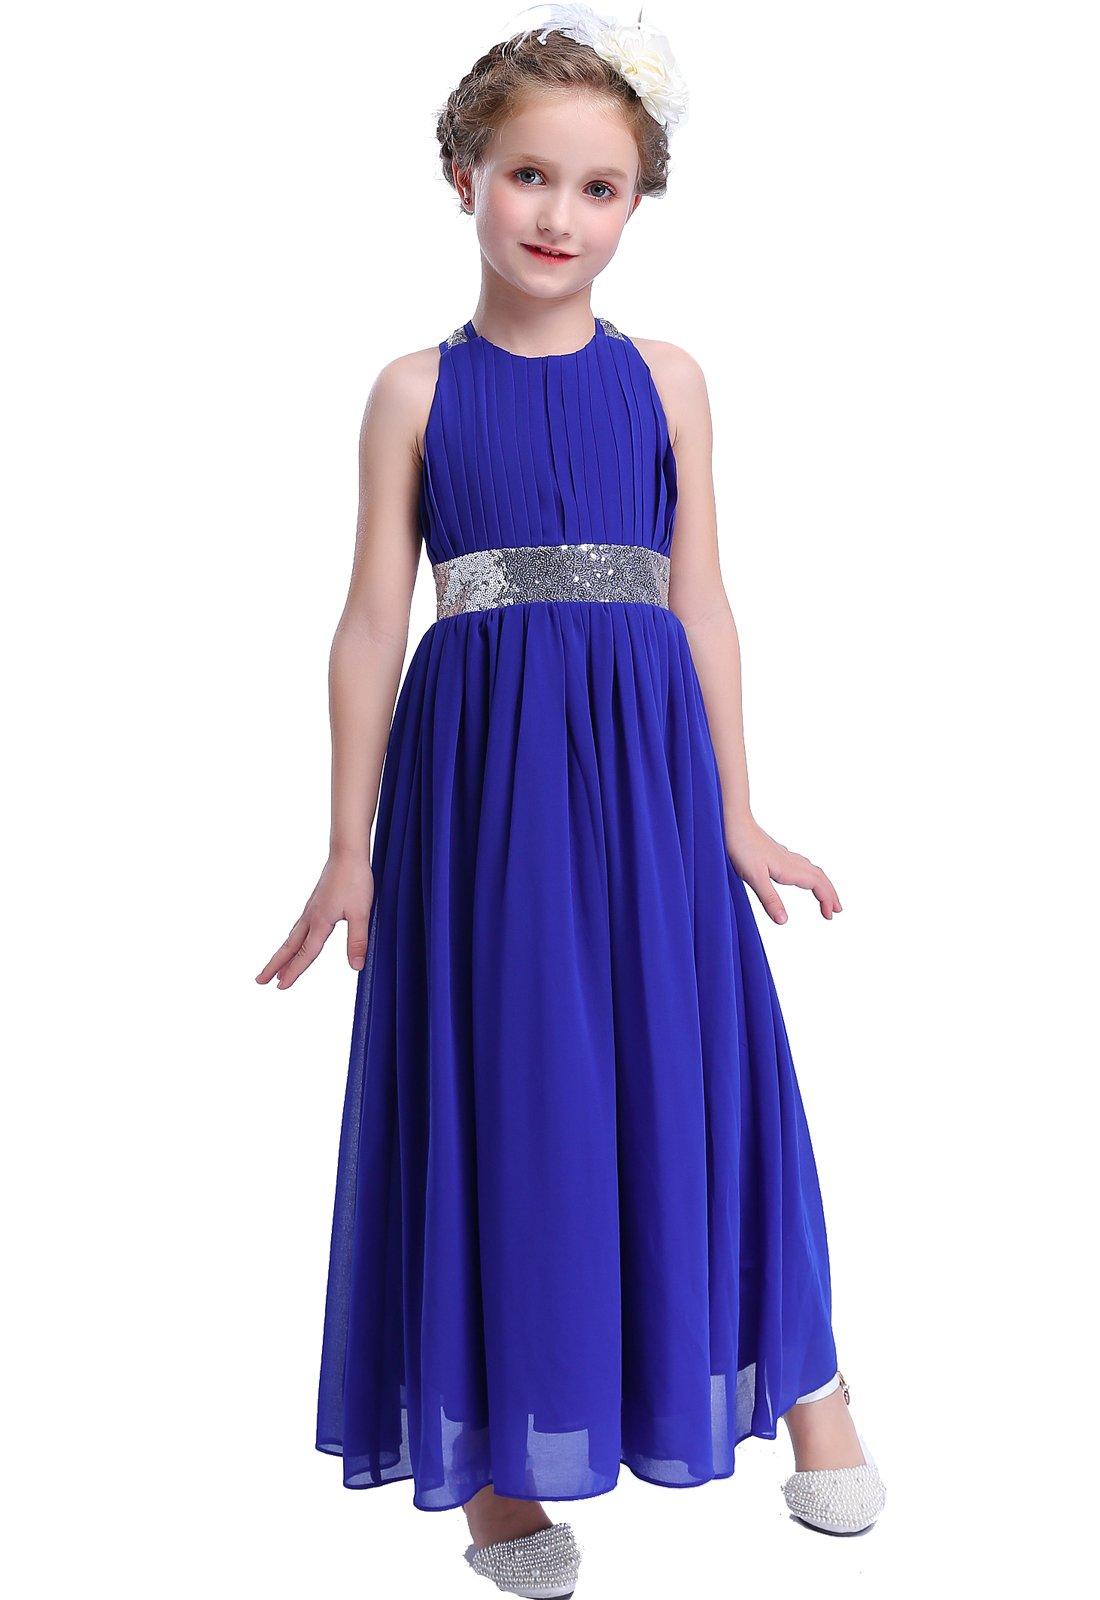 Happy Rose Bling Bling Sequins Chiffon Girls Dress Royal Blue Size 14